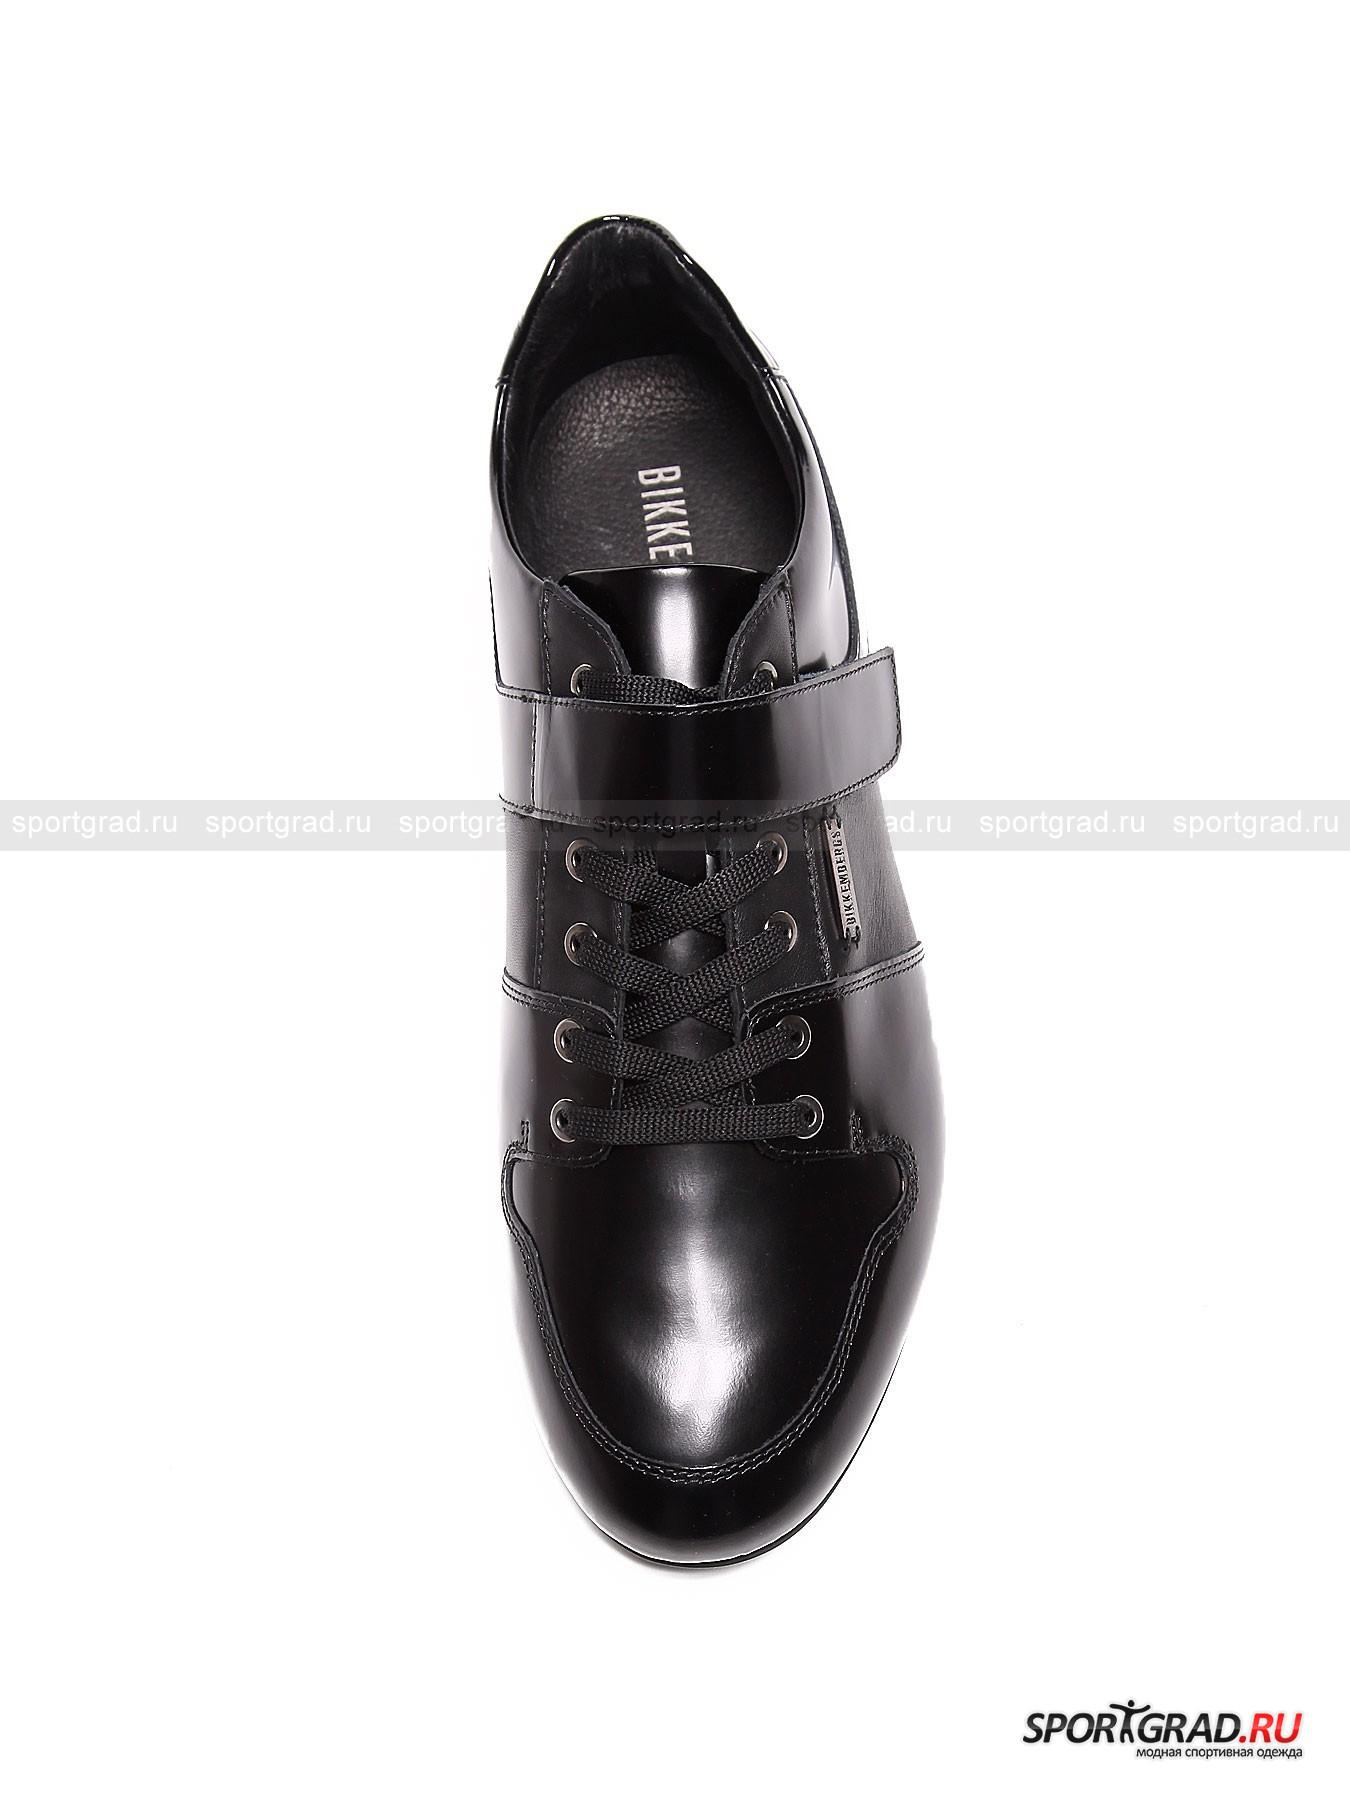 Кроссовки мужские BIKKEMBERGS Springer 156 Leather от Спортград